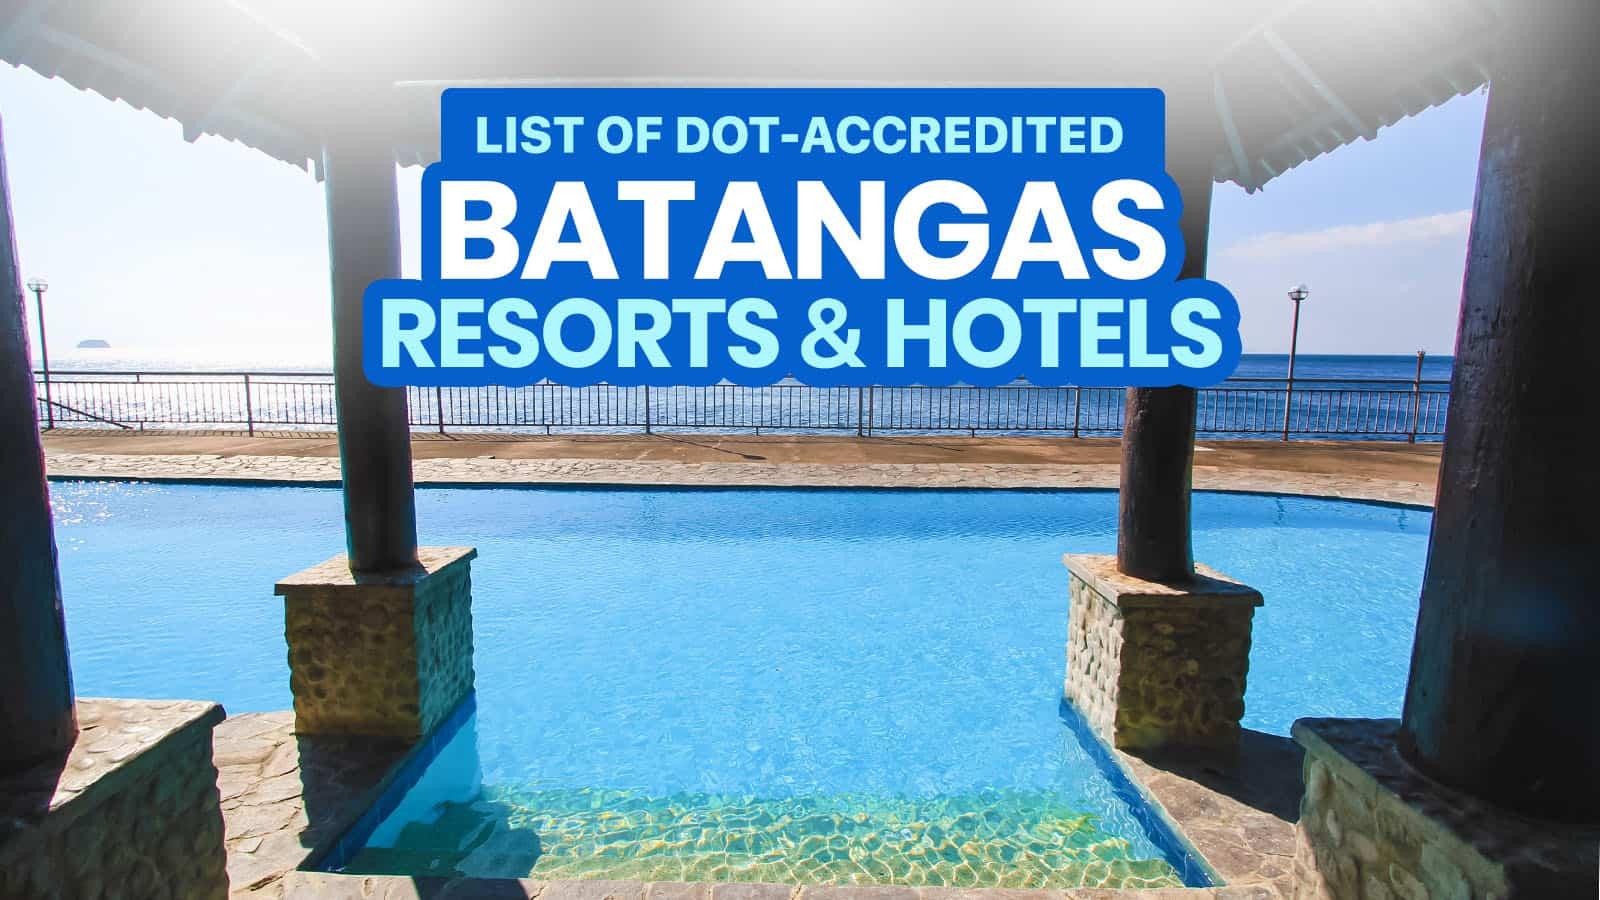 2021 List of DOT-Accredited BATANGAS Hotels & Beach Resorts